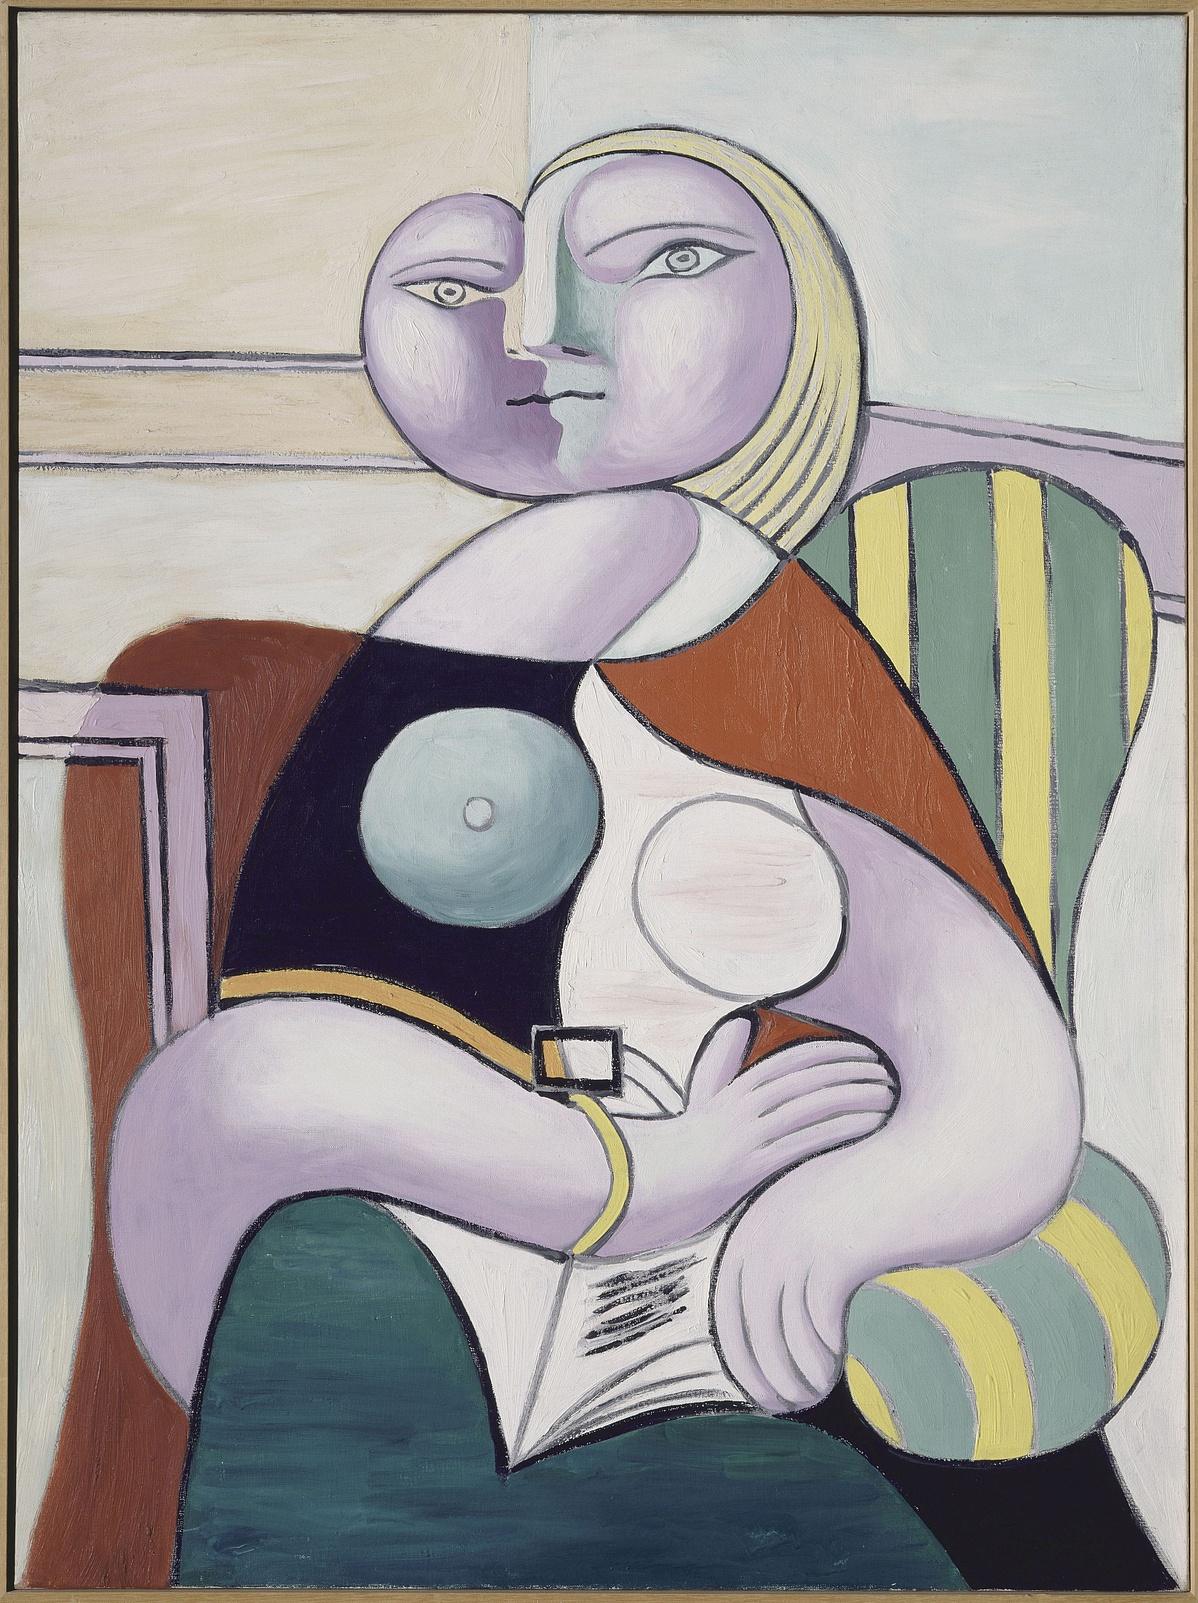 Pablo Picasso: Olvasó nő, 1932